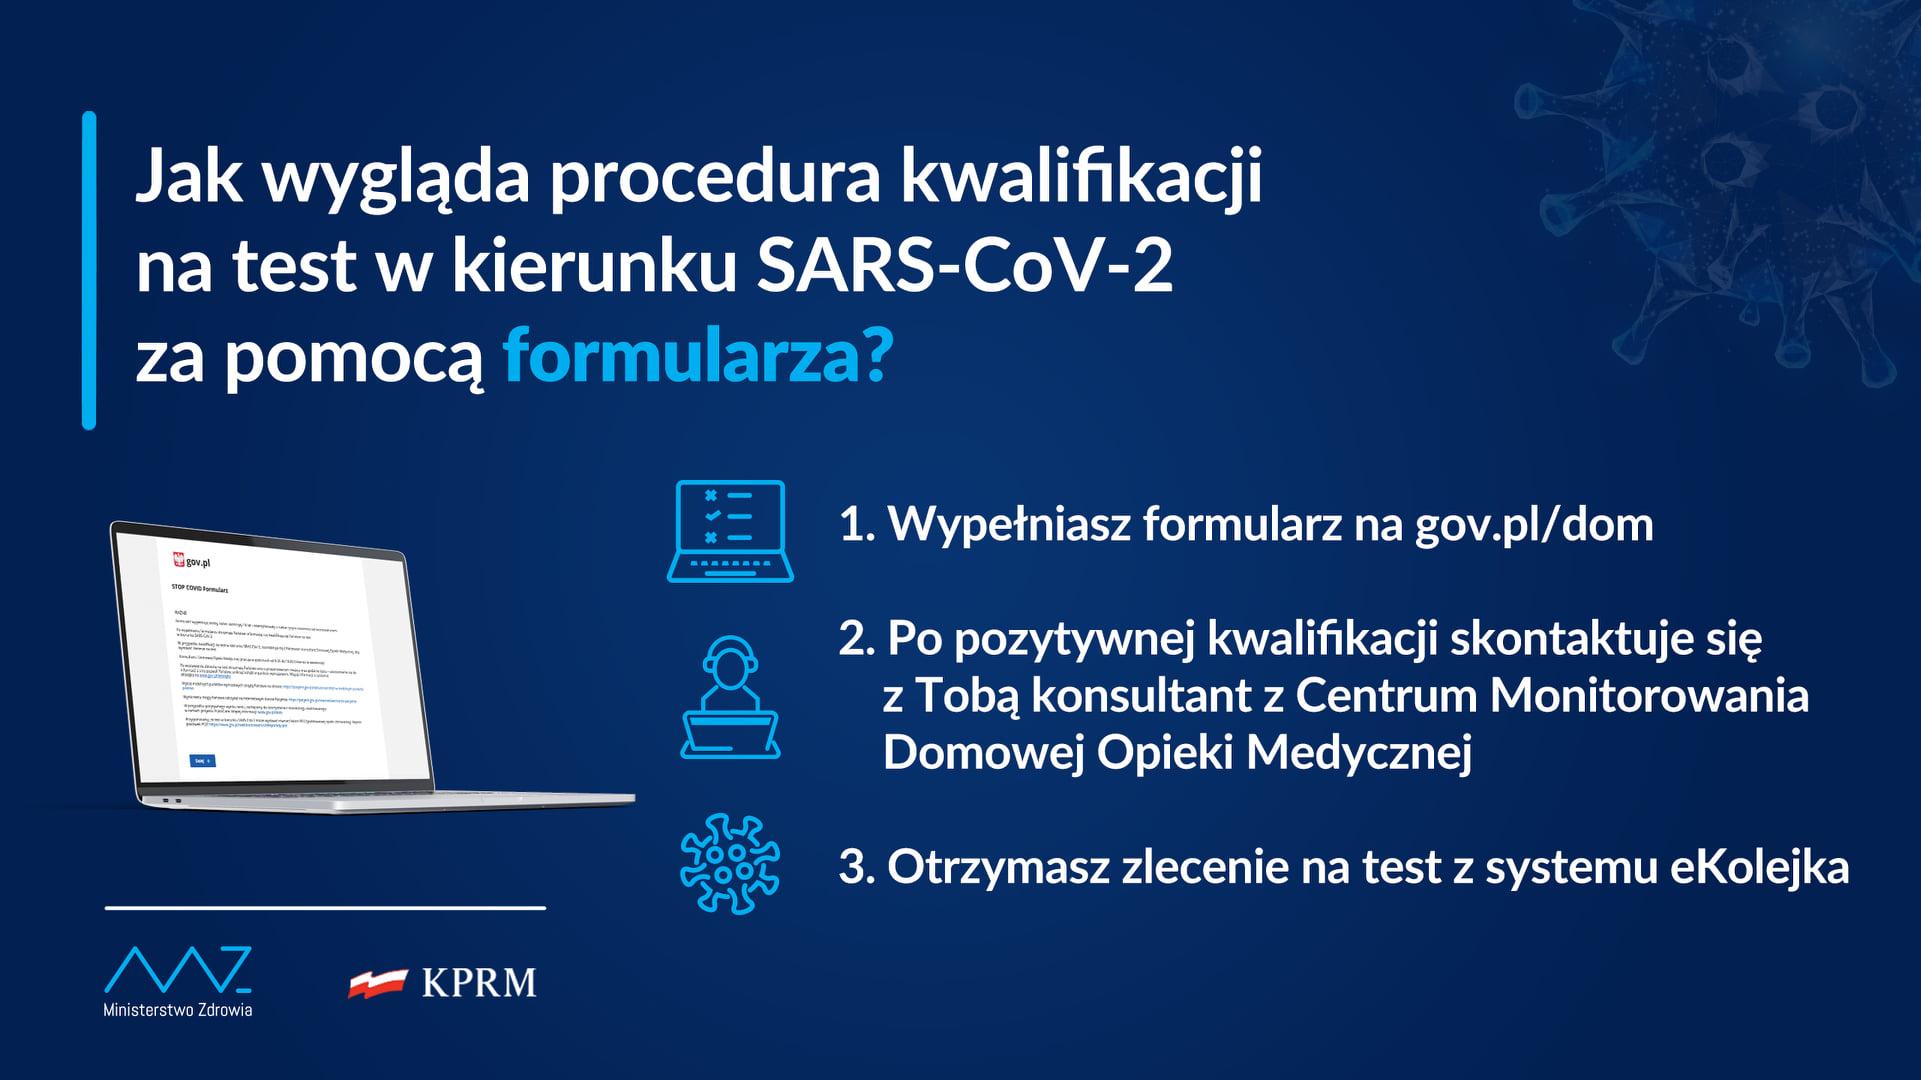 Formularz - www.gov.pl/dom